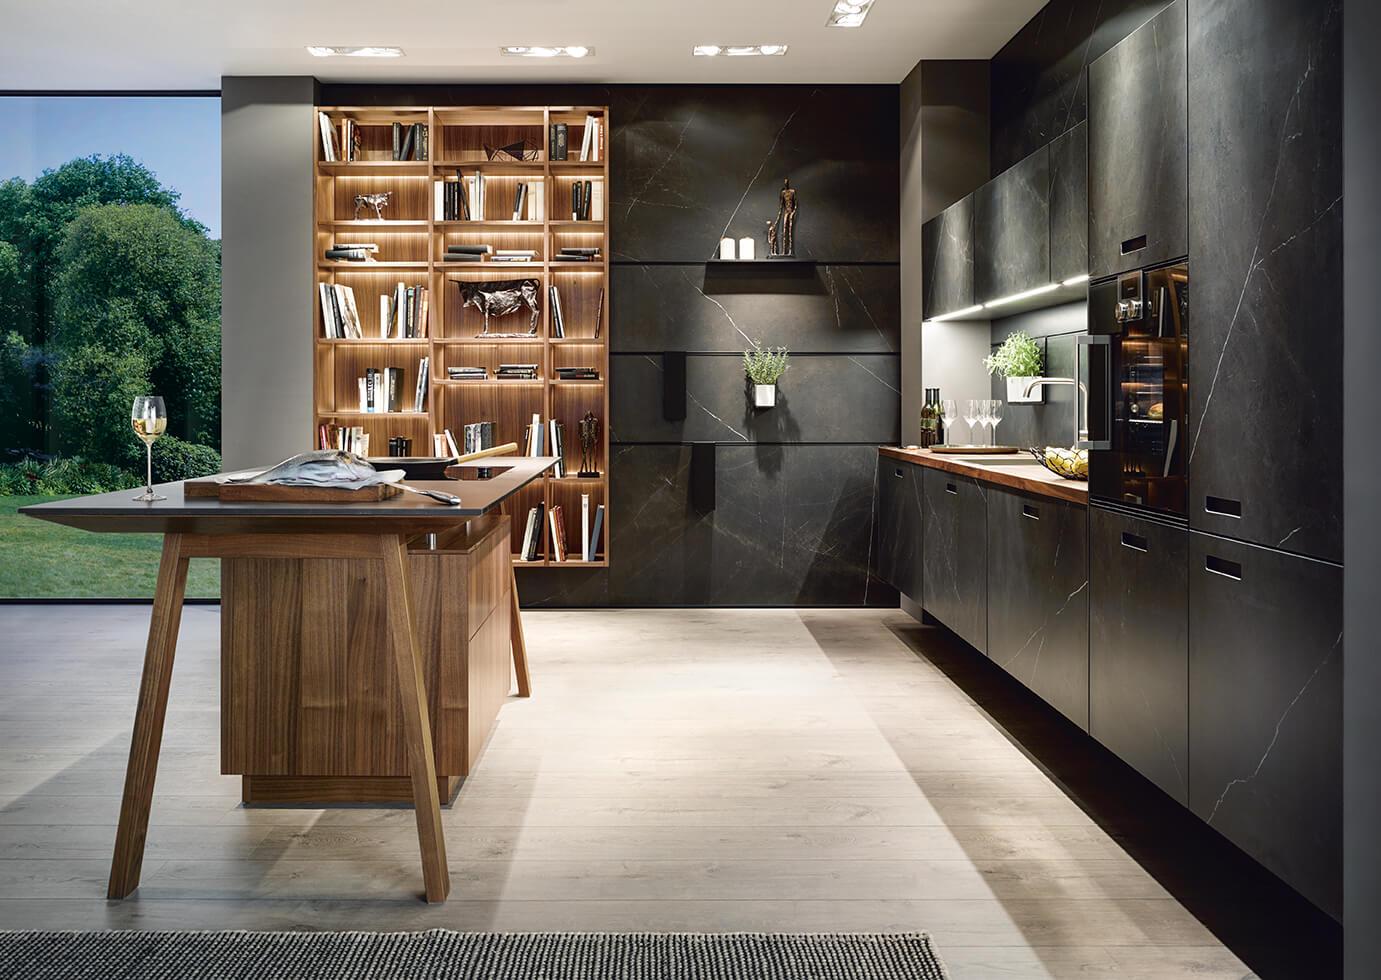 German Design by Schuller Kitchens